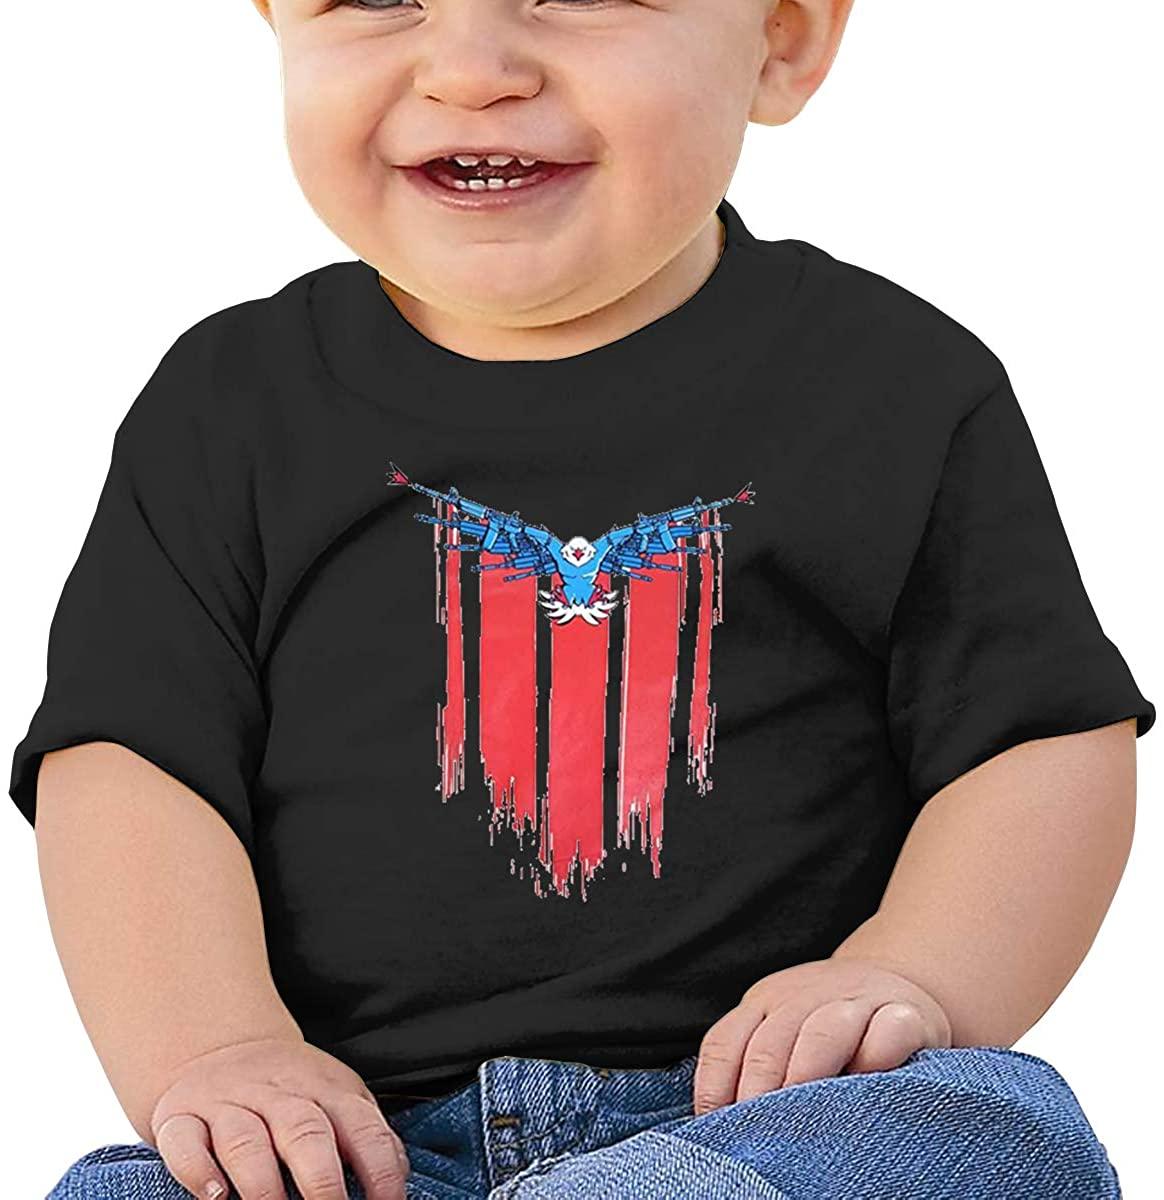 6-24 Months Boy and Girl Baby Short Sleeve T-Shirt Demolition Ranch Original Minimalist Style Black